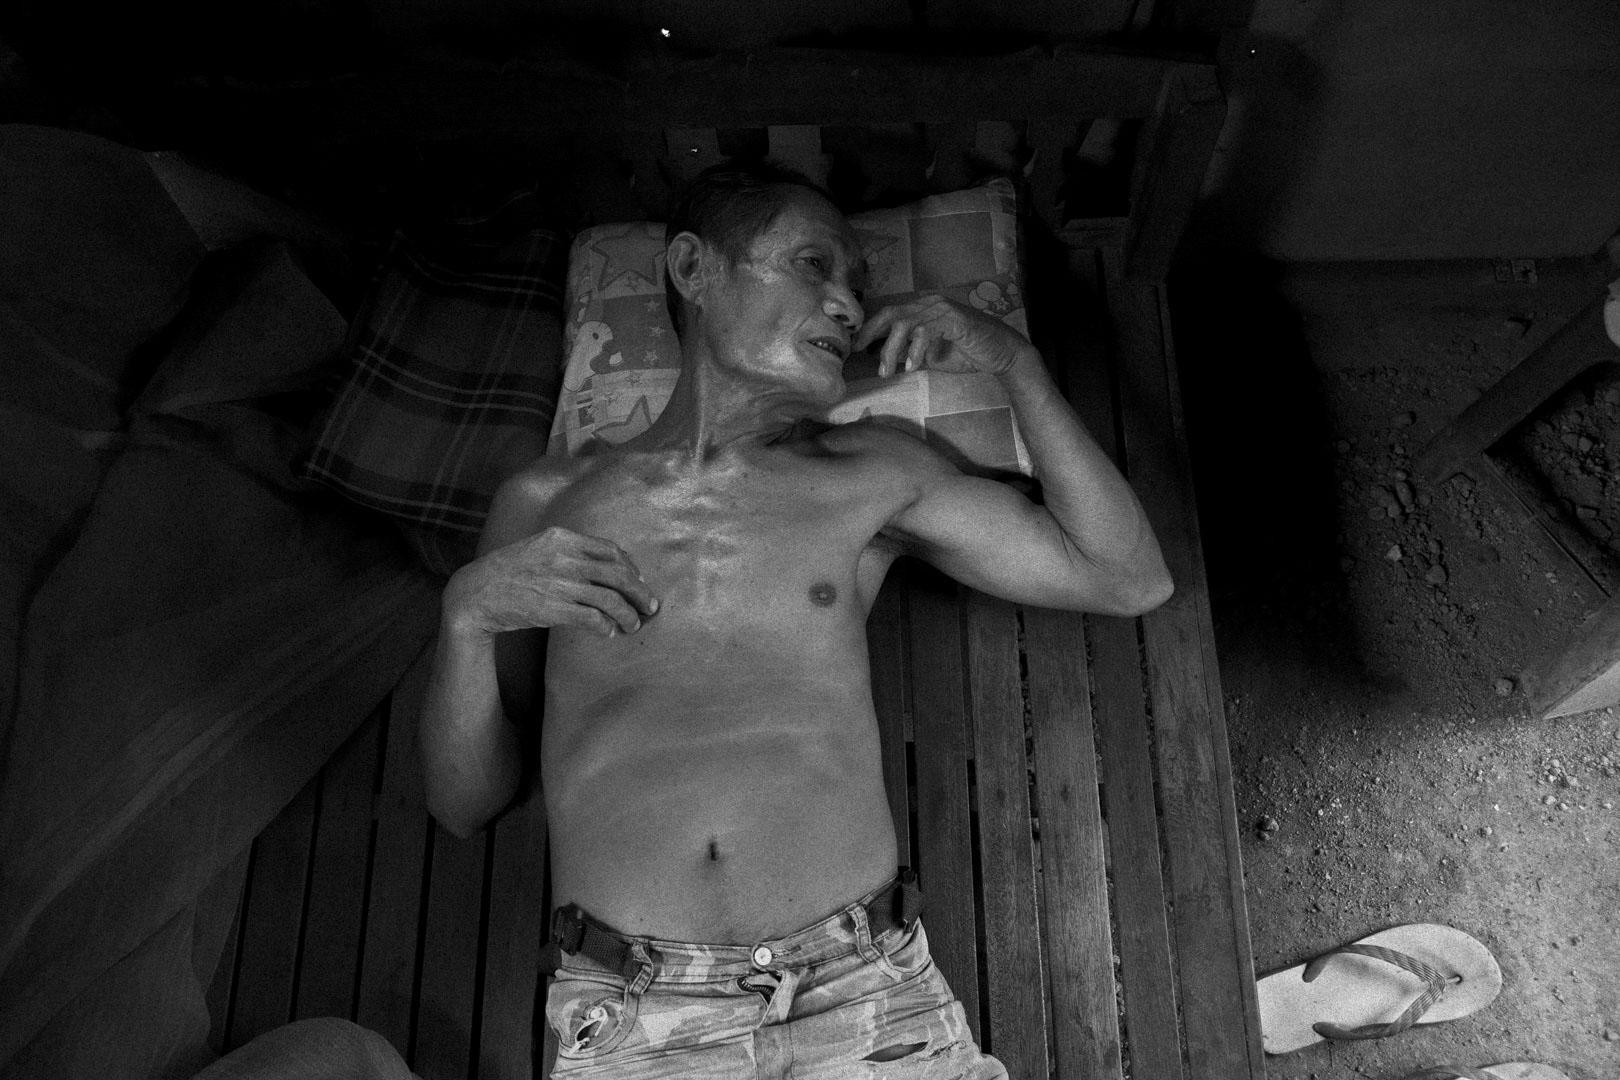 norberto-tongoy-buwas-tomorrow-cadiz-photo-10.jpg